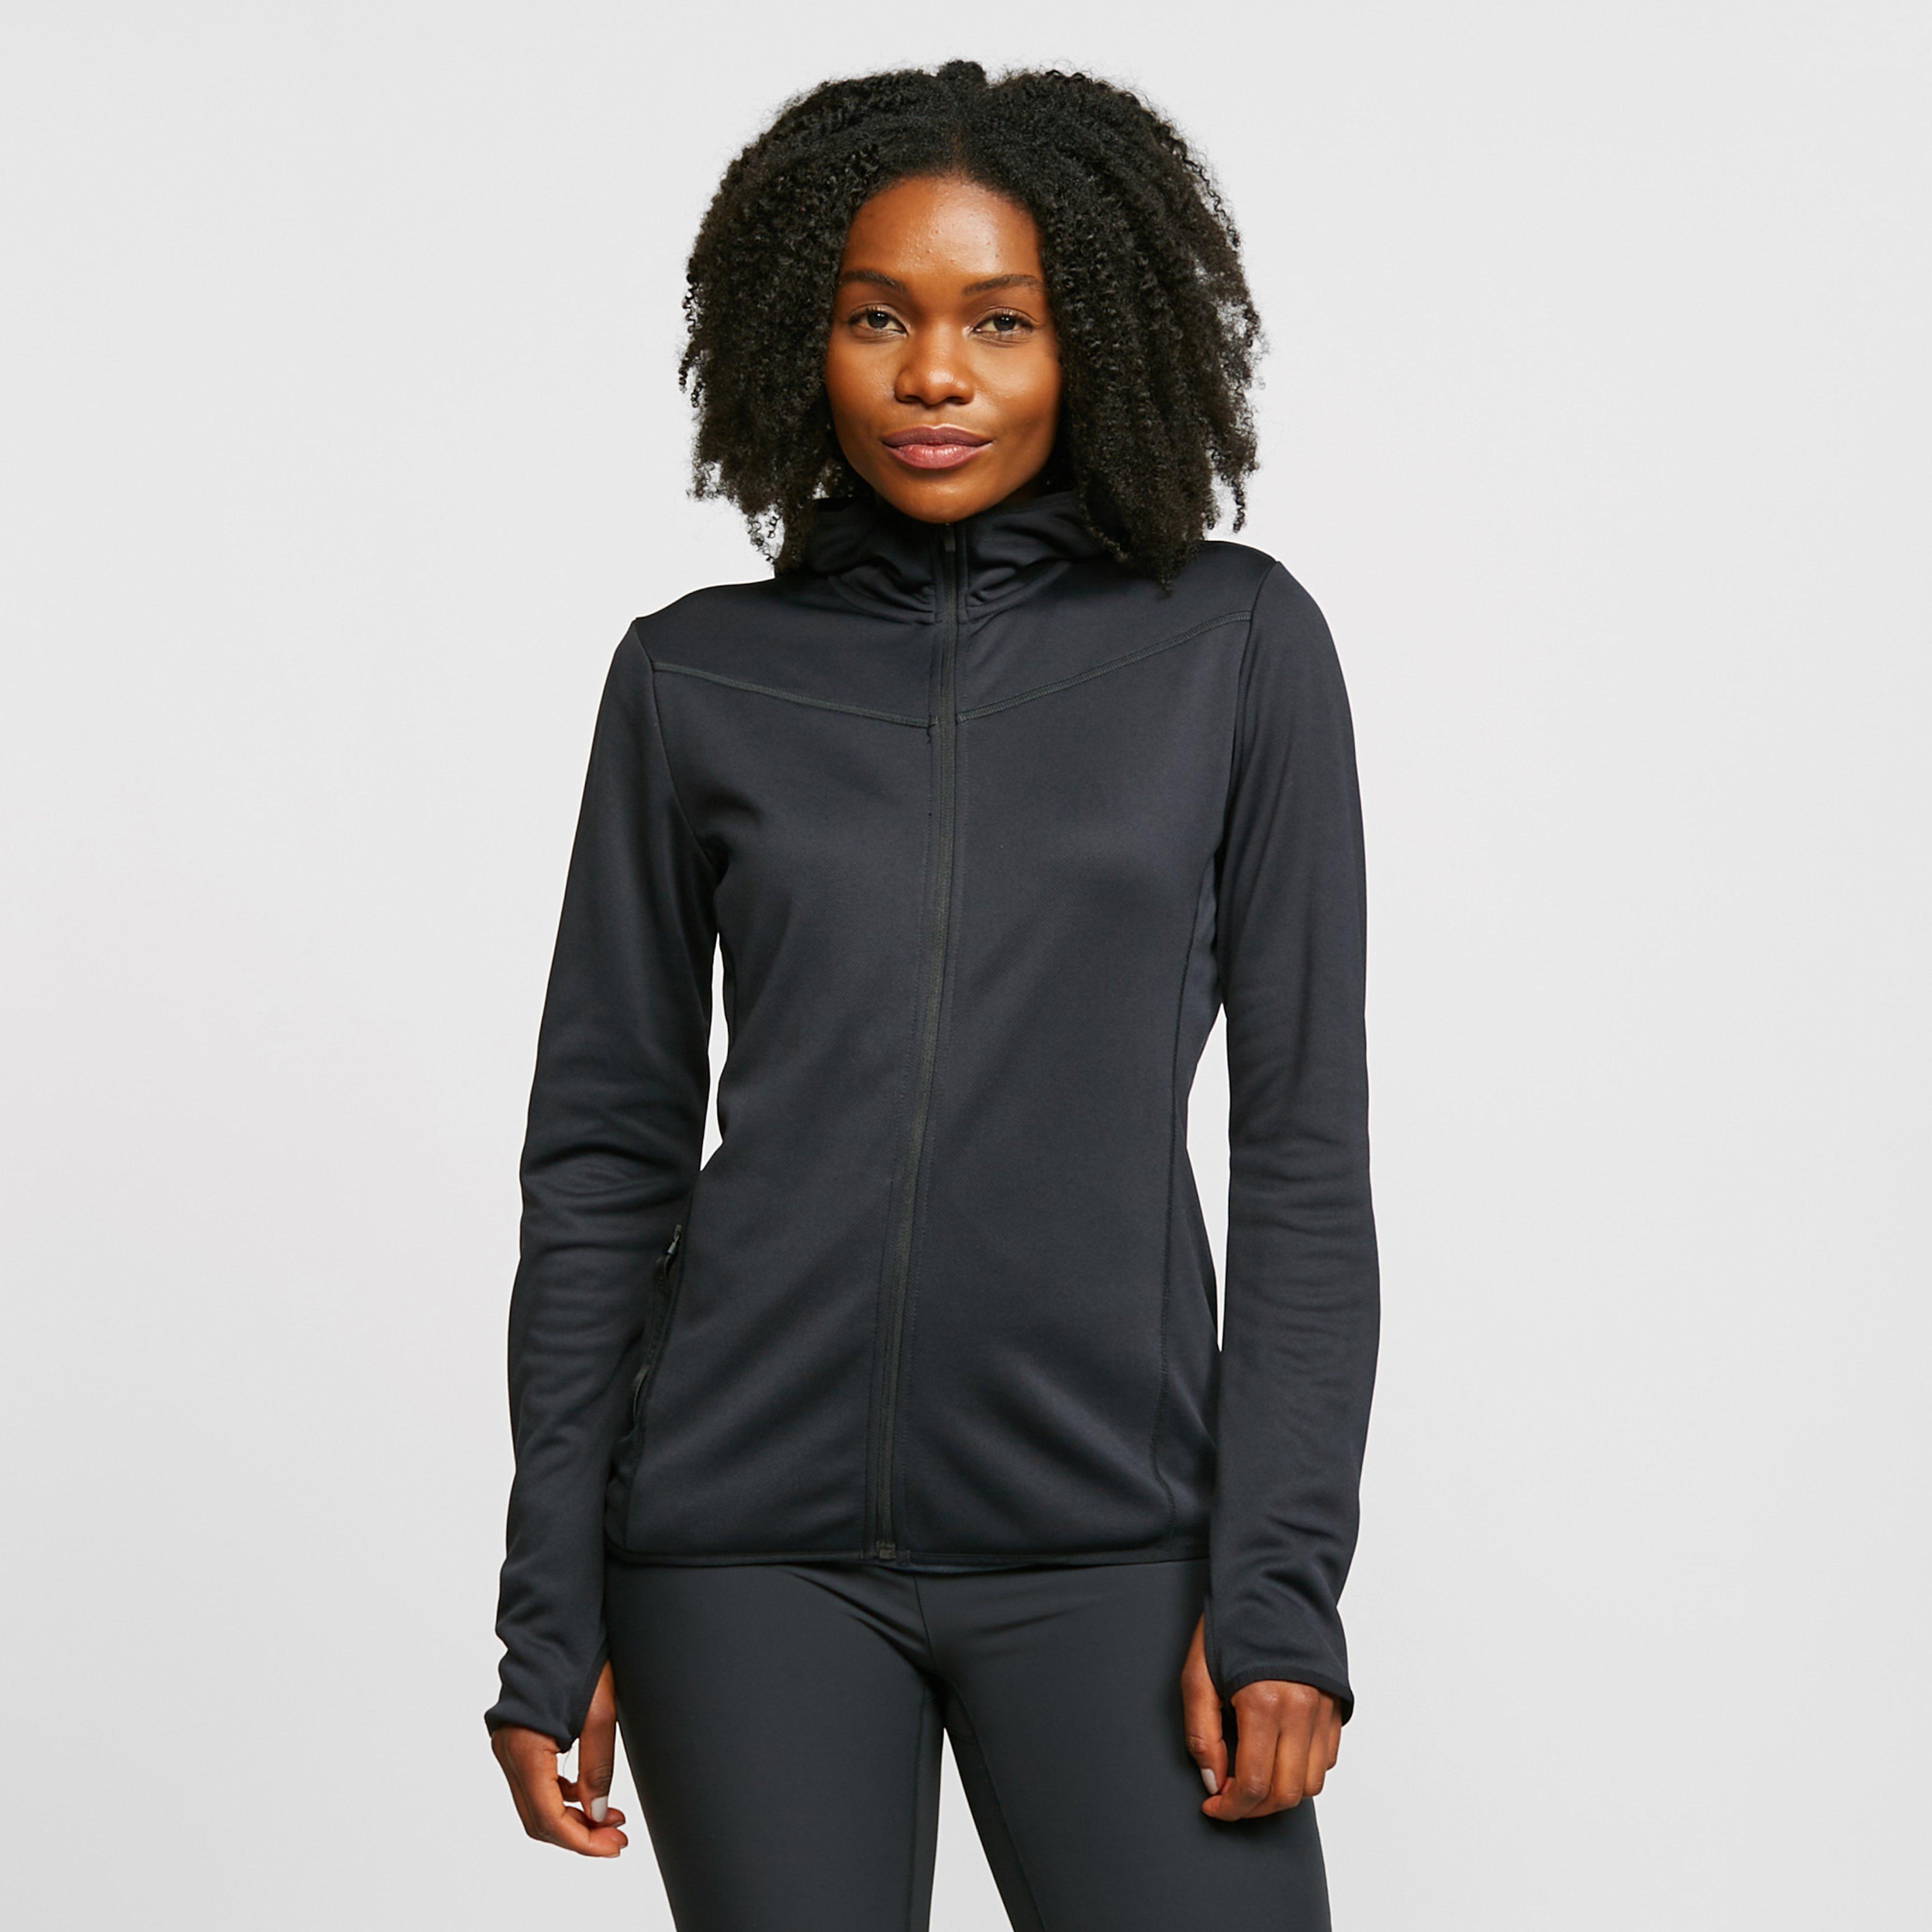 Craft Craft Womens Eaze Sweat Hood Jacket